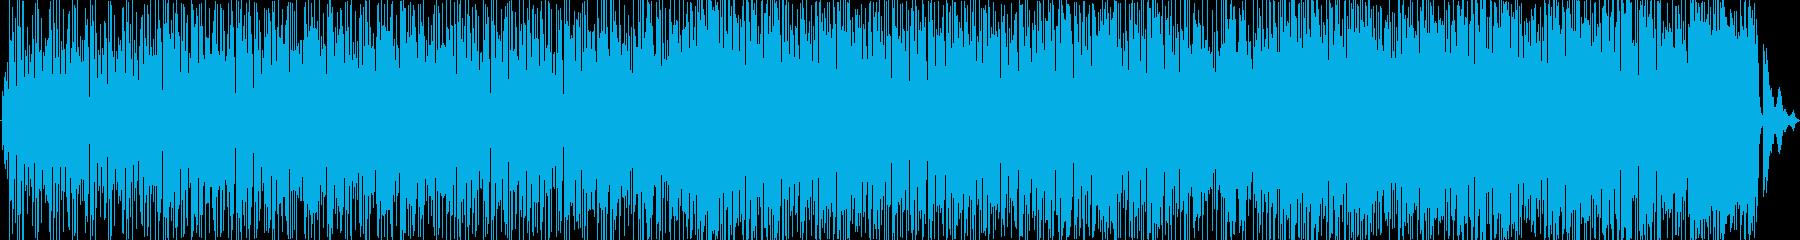 Hip Hop調の都会的なBGMの再生済みの波形